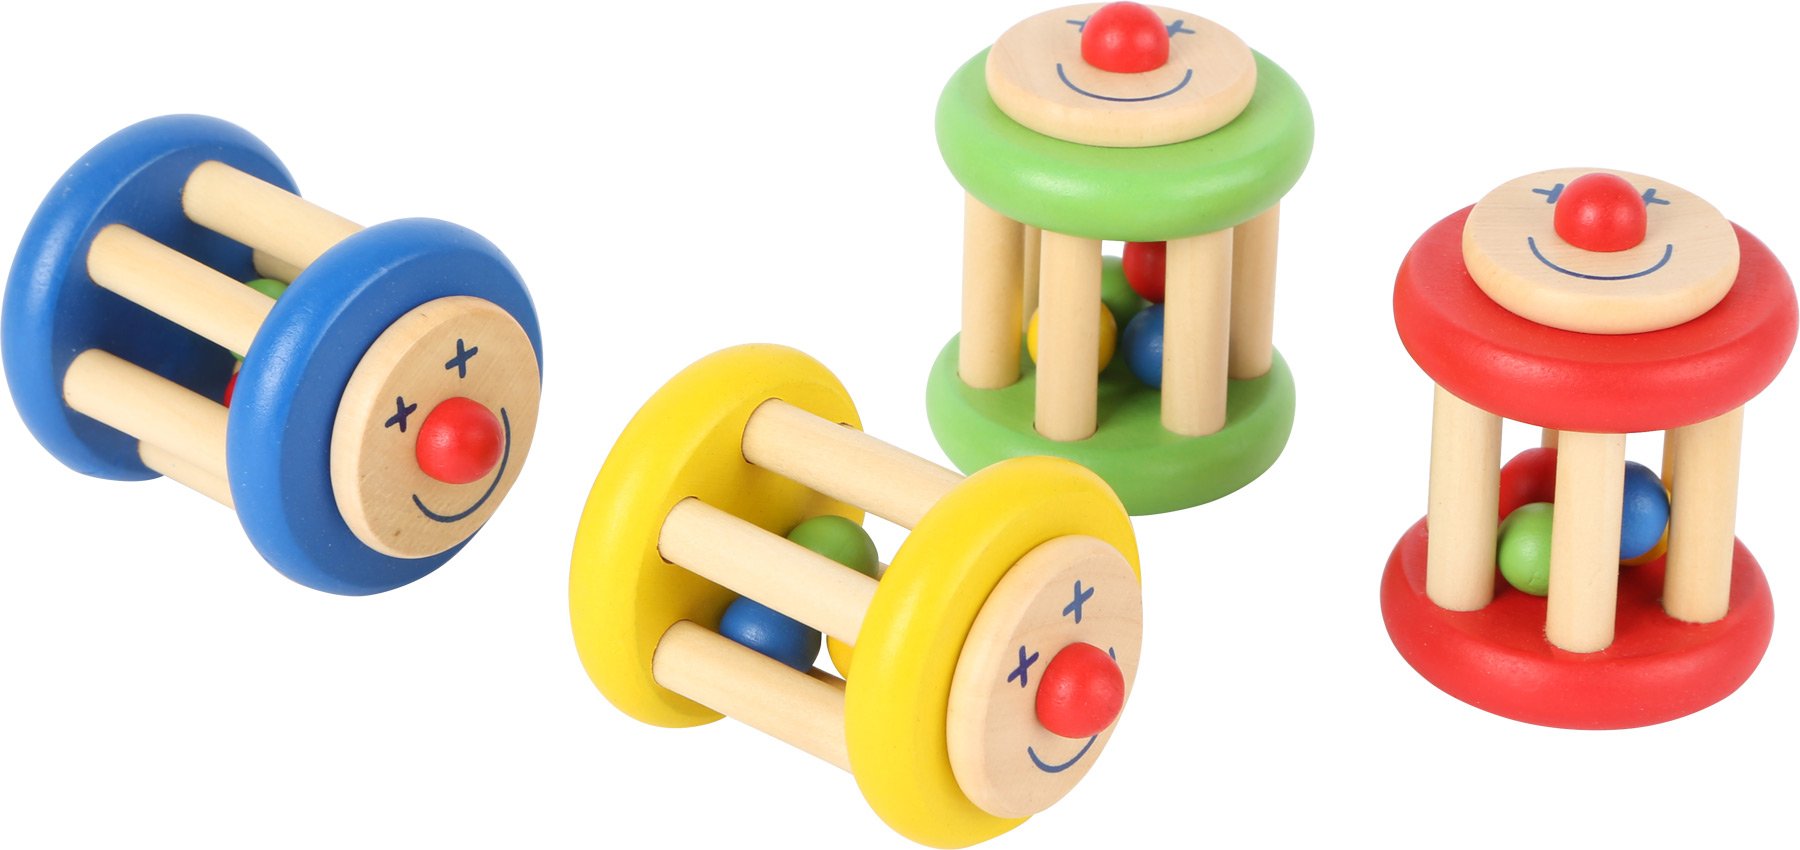 Displej- Dřevěné chrastítko -  Klaun 1 ks žlutá